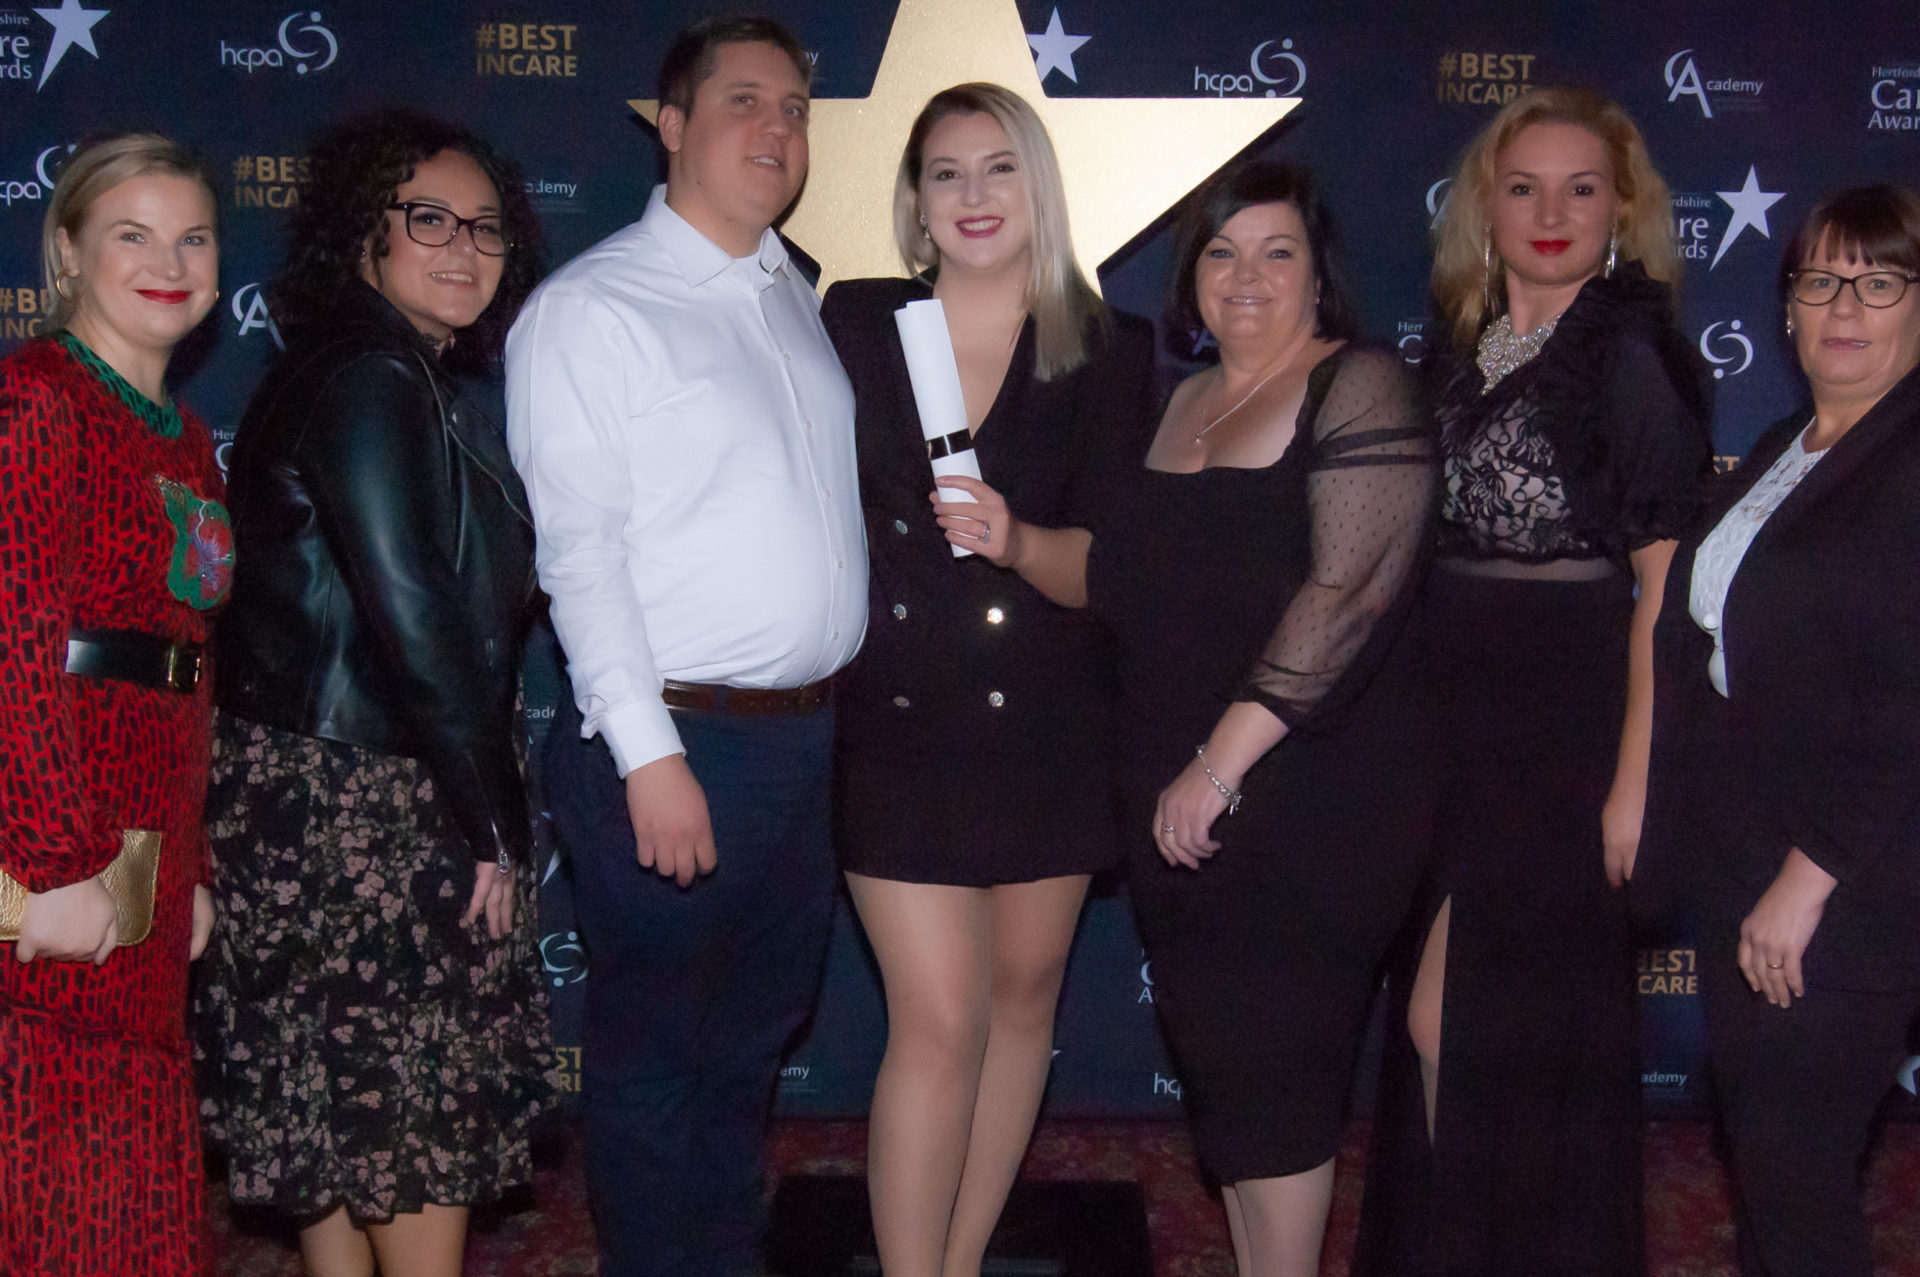 Care Awards-21